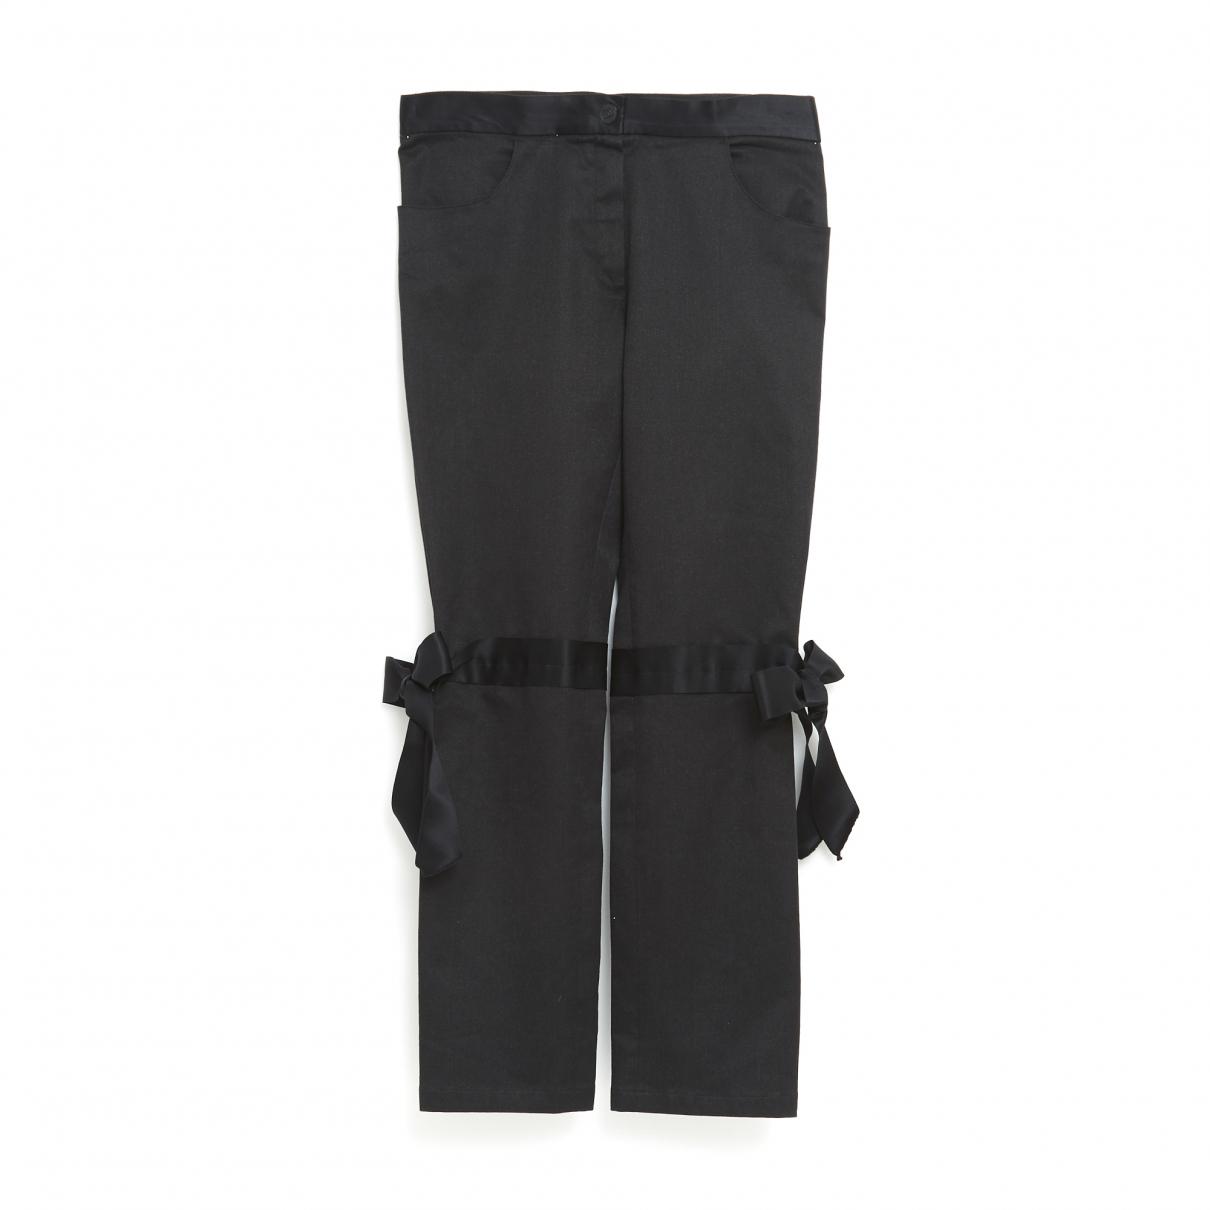 Chanel \N Black Cotton - elasthane Jeans for Women 33 US